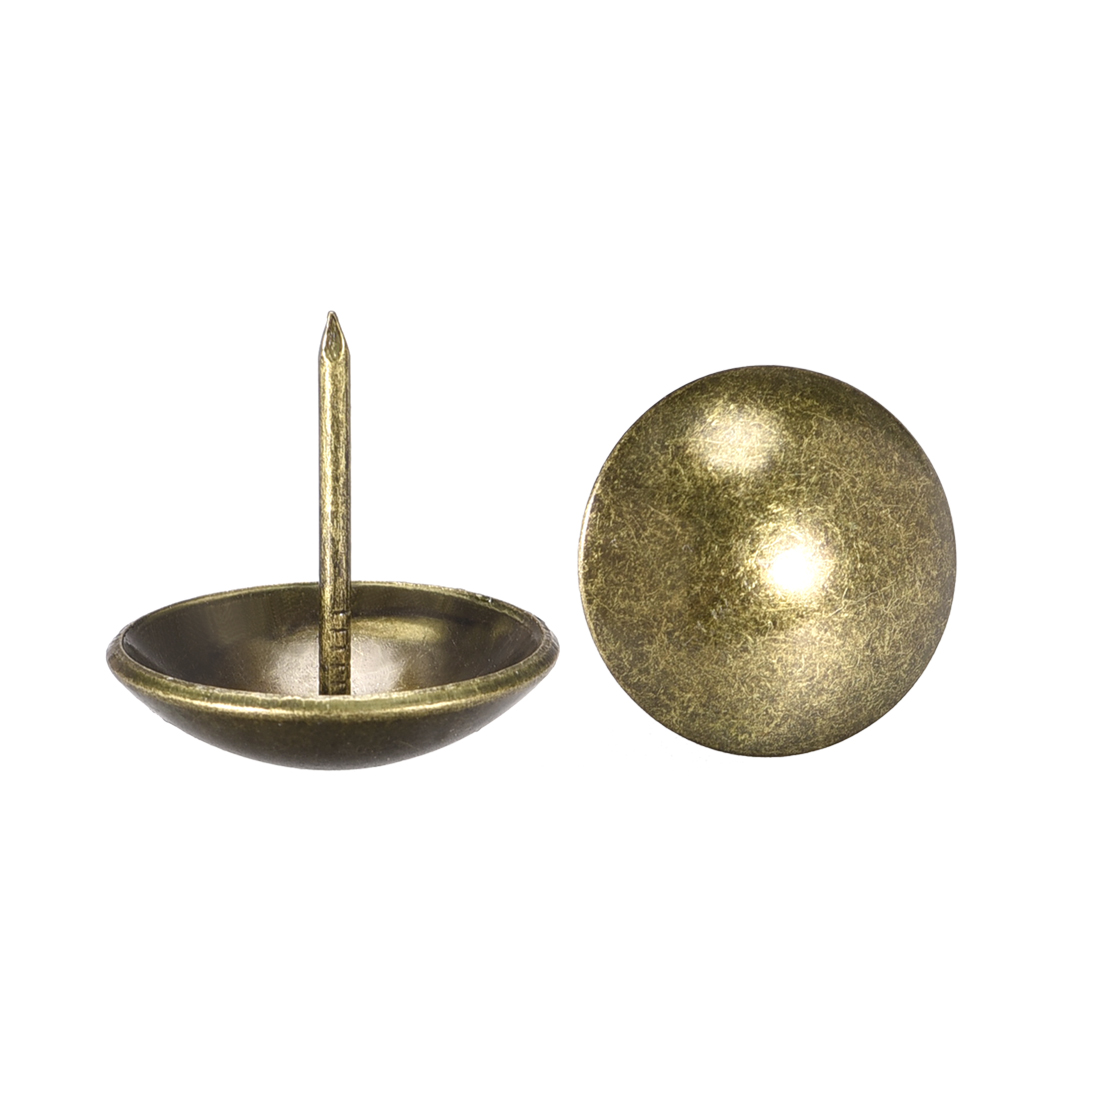 Upholstery Nails Tacks 25mm Dia 25mm Height Round Push Pins Bronze Tone 50 Pcs